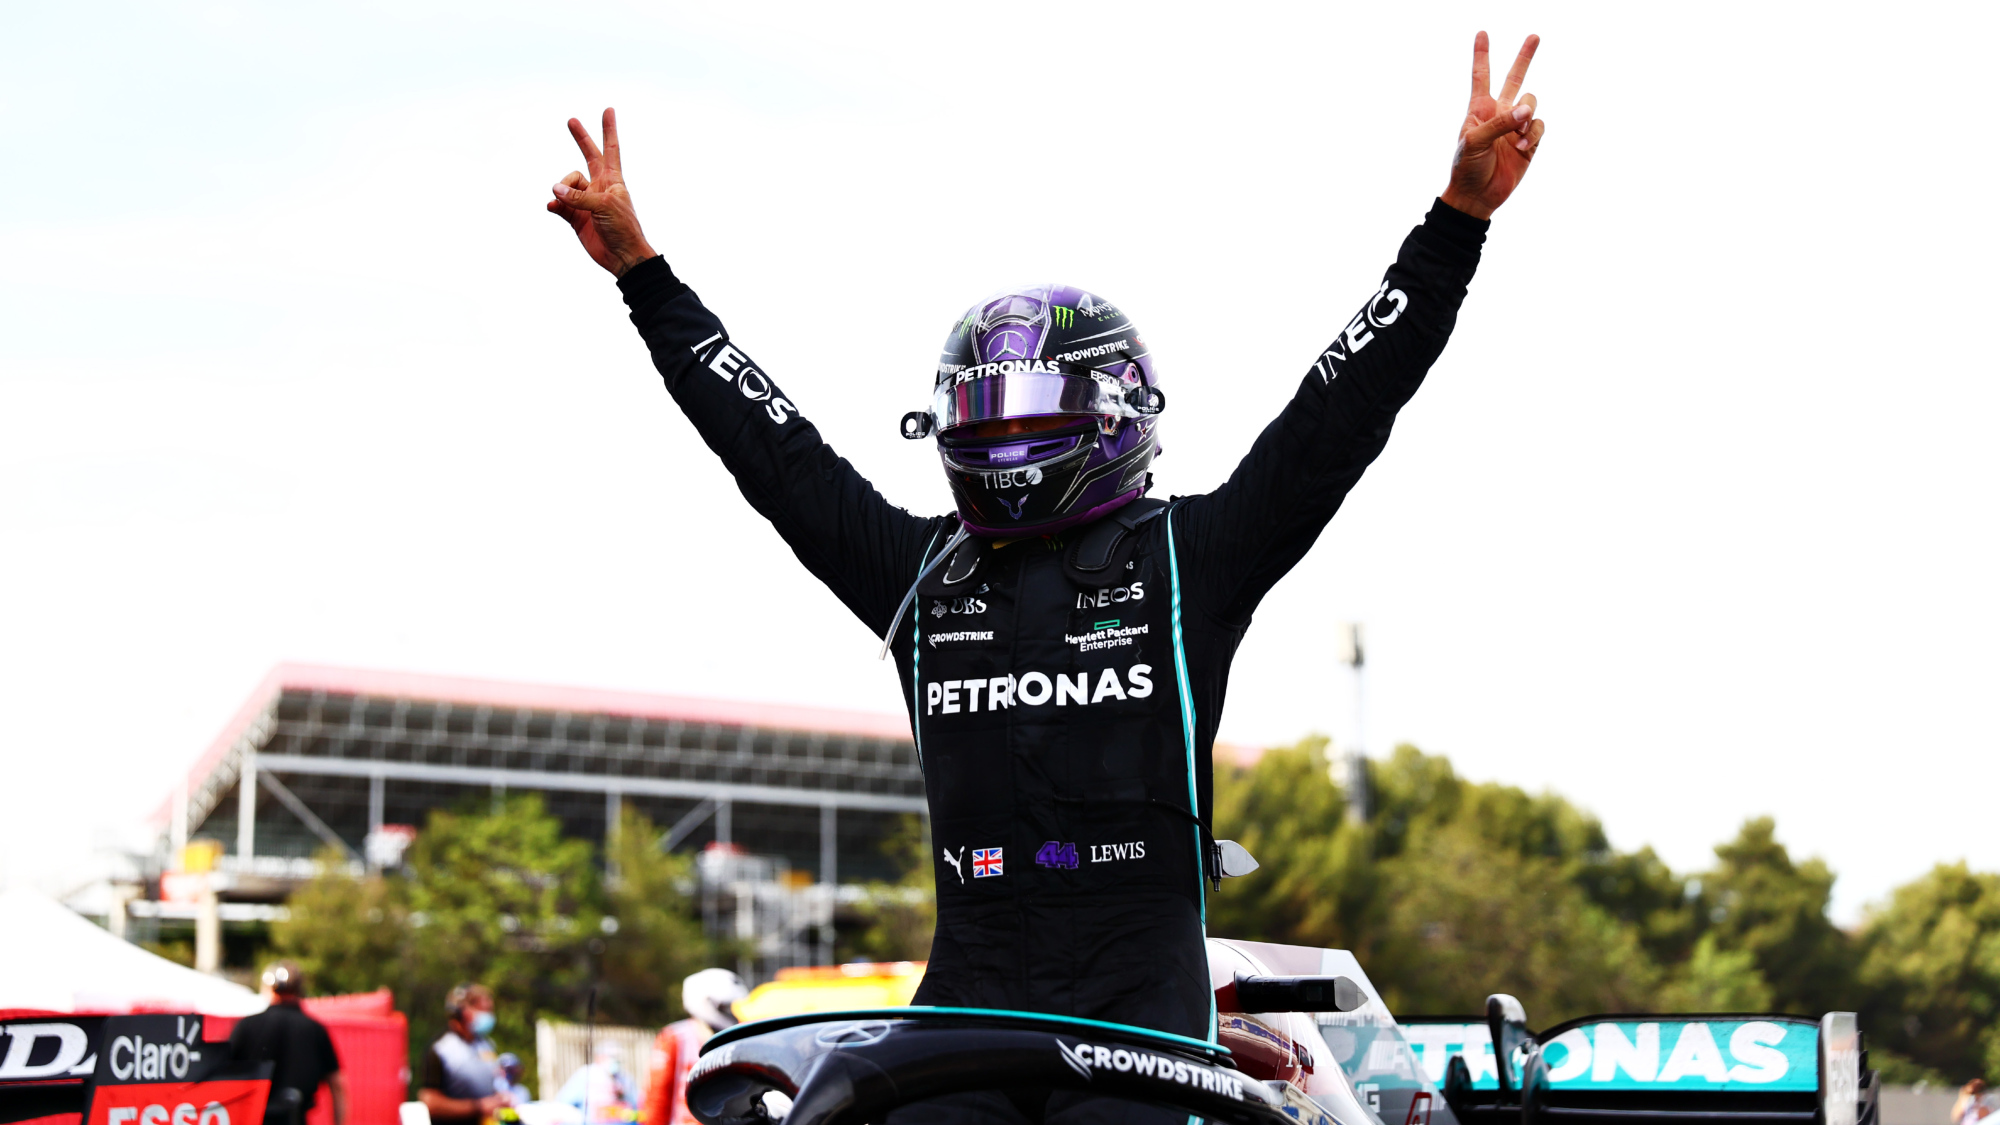 Lewis Hamilton, 2021 Spanish GP